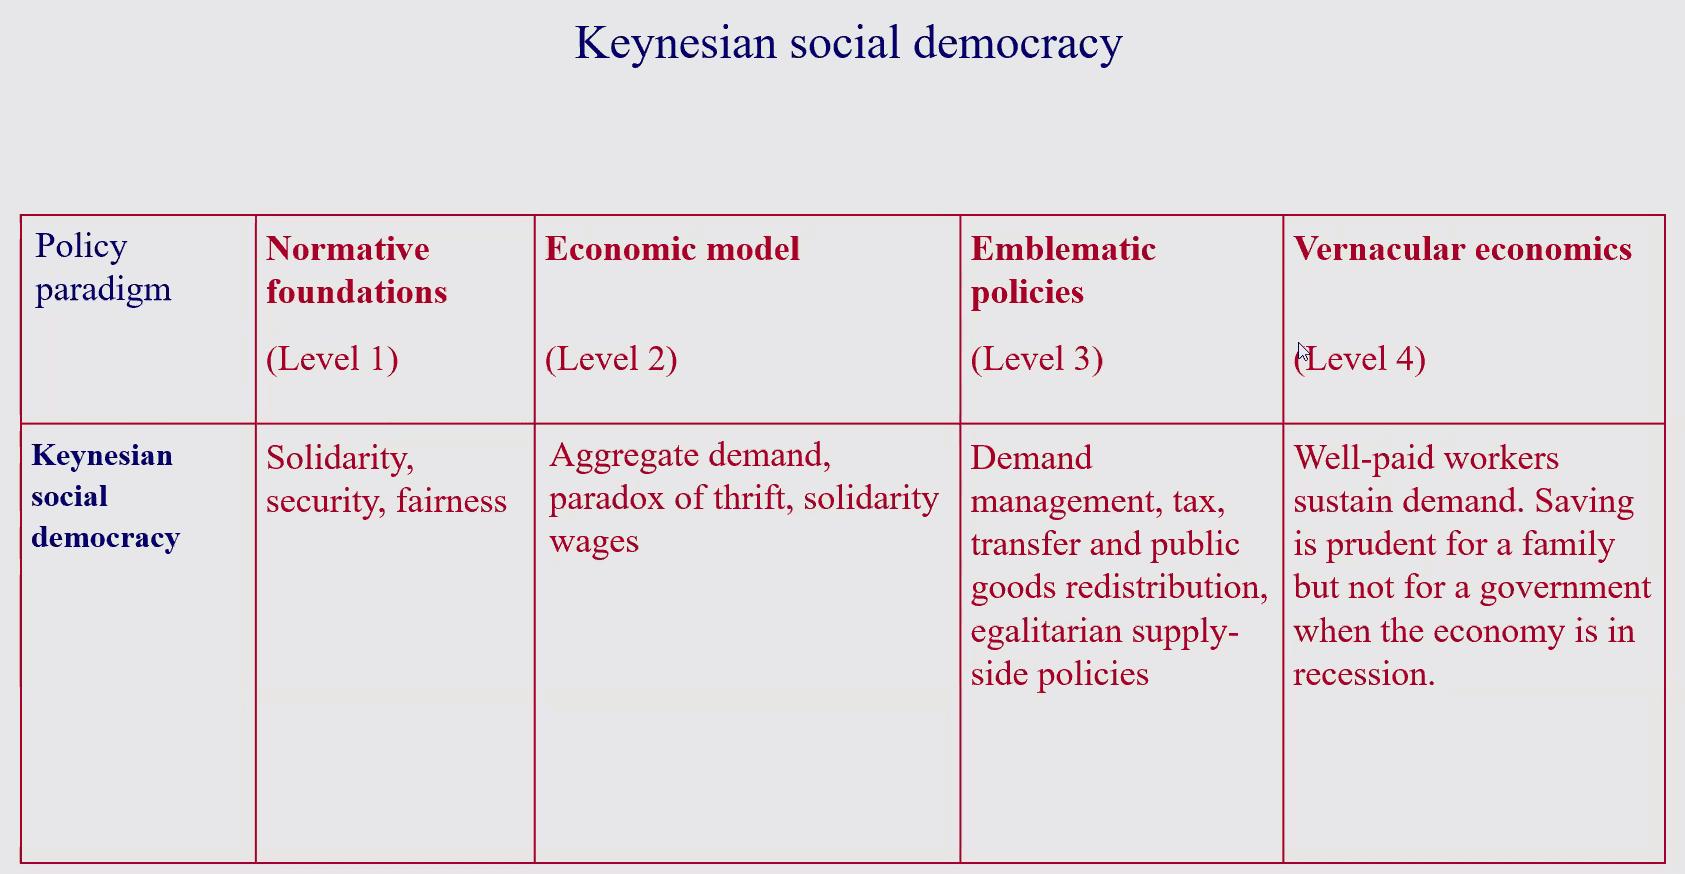 02 Keynesian social democracy